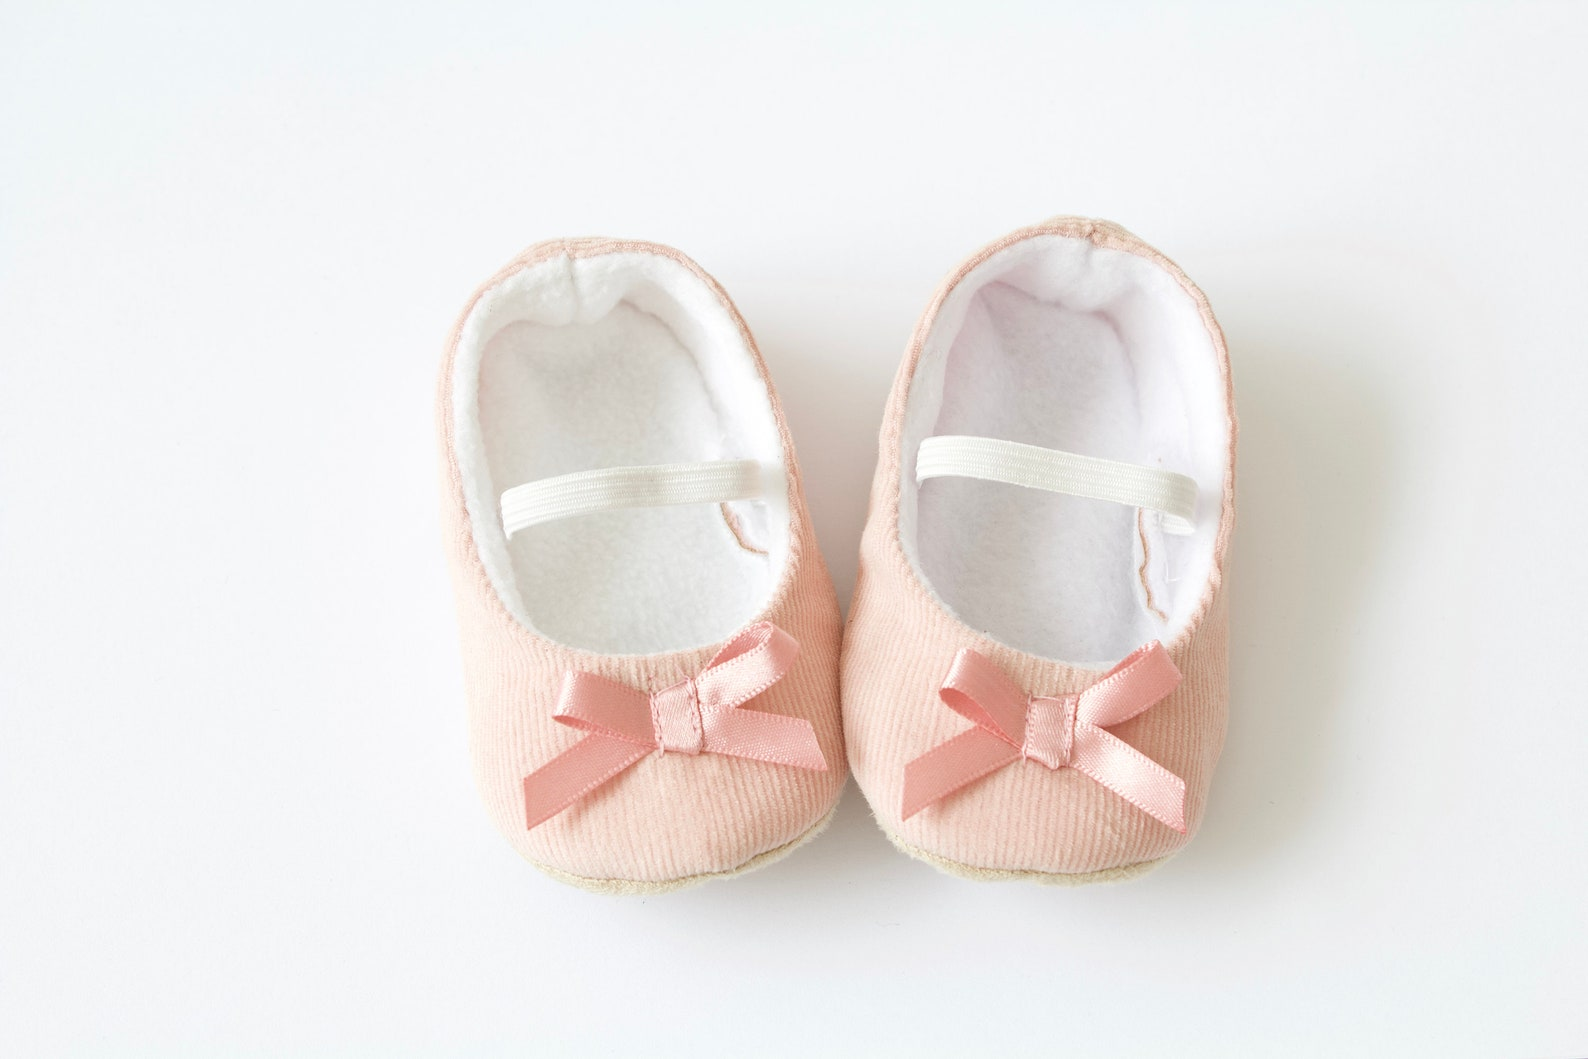 baby girl shoe, baby shoe ballet flat, pink baby girl shoe, girls shoe, pink corduroy ballet flats with pink satin bow.